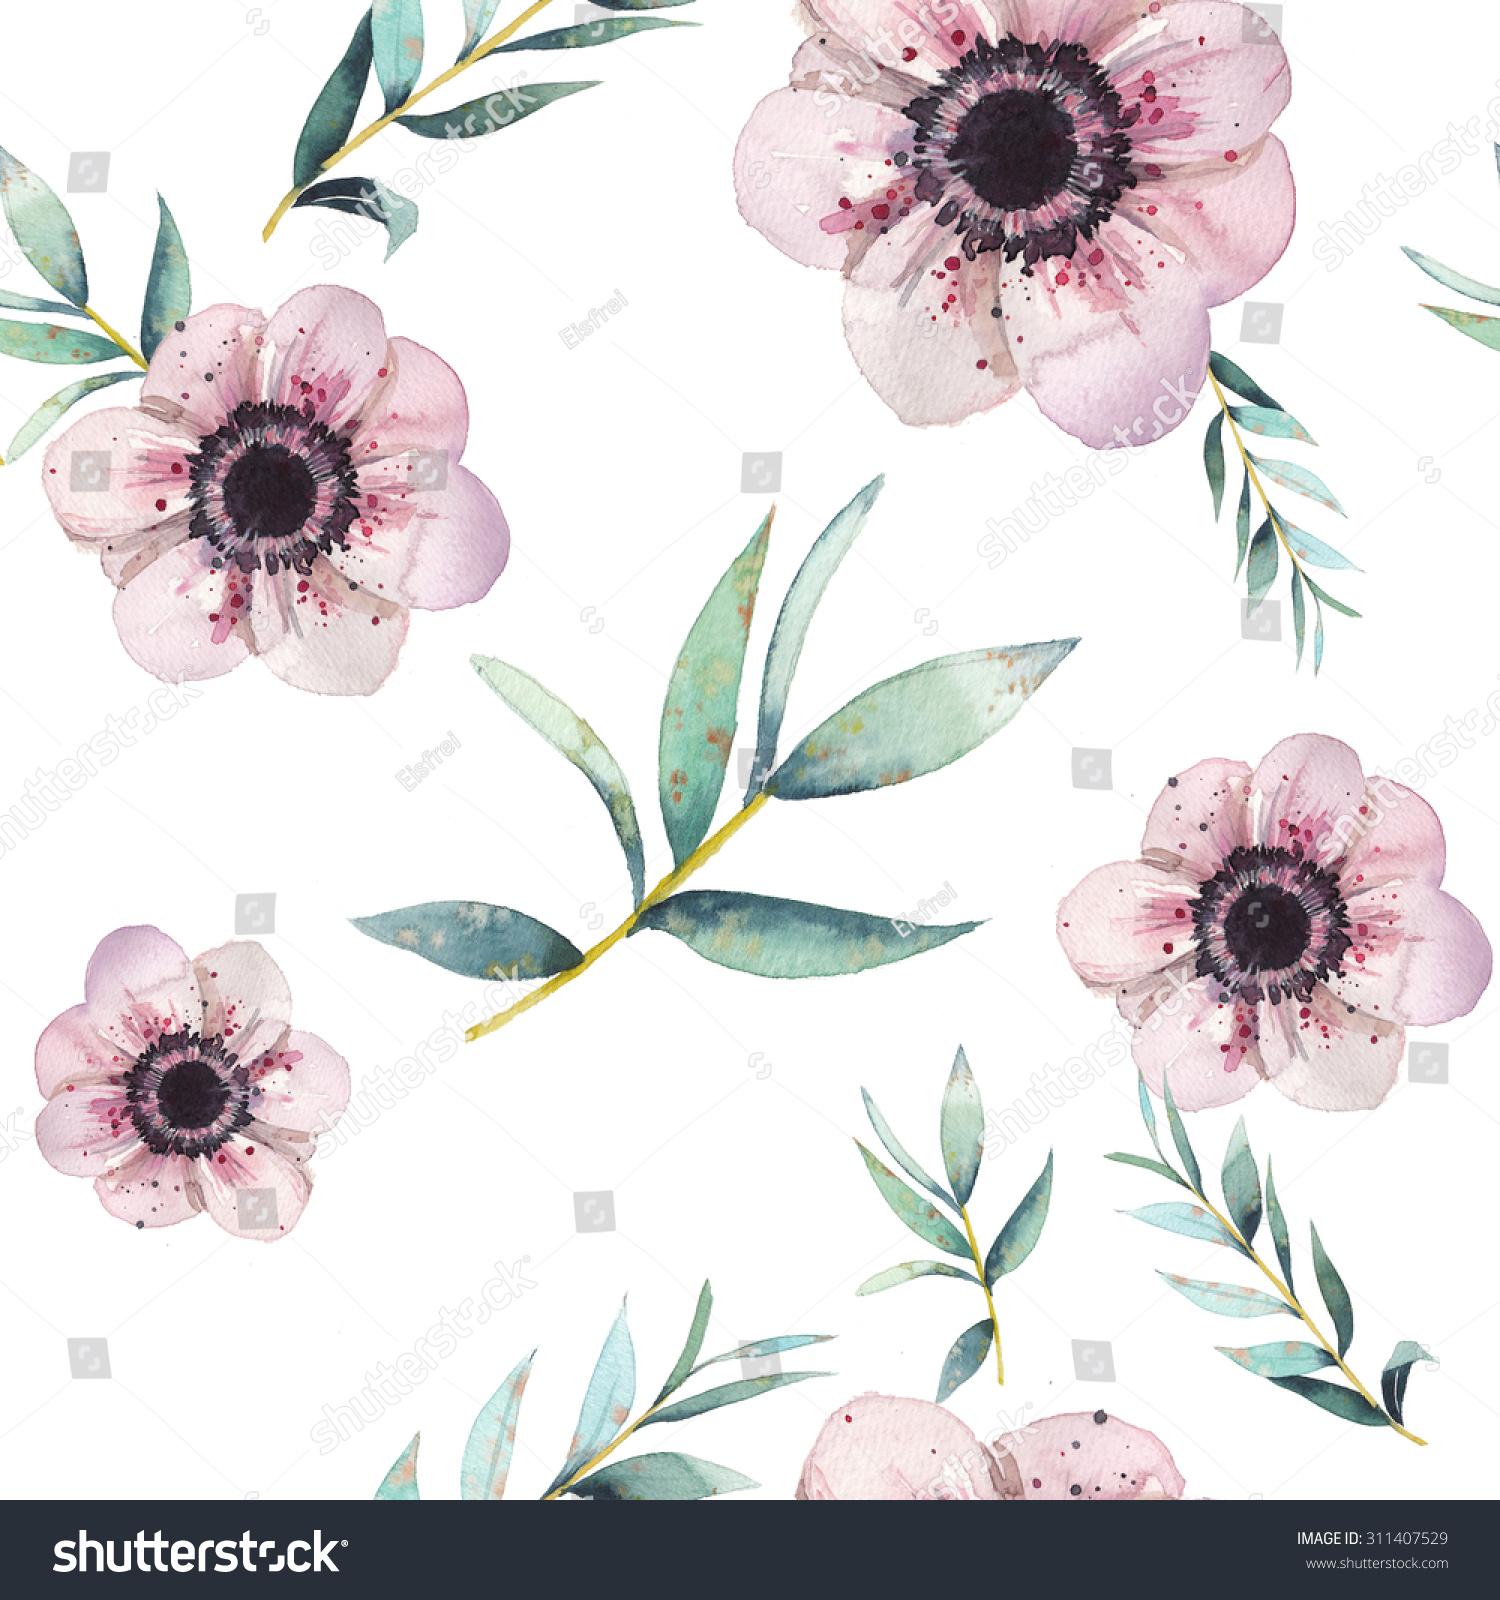 Watercolor Leaves Flowers Seamless Pattern Vintage Stock